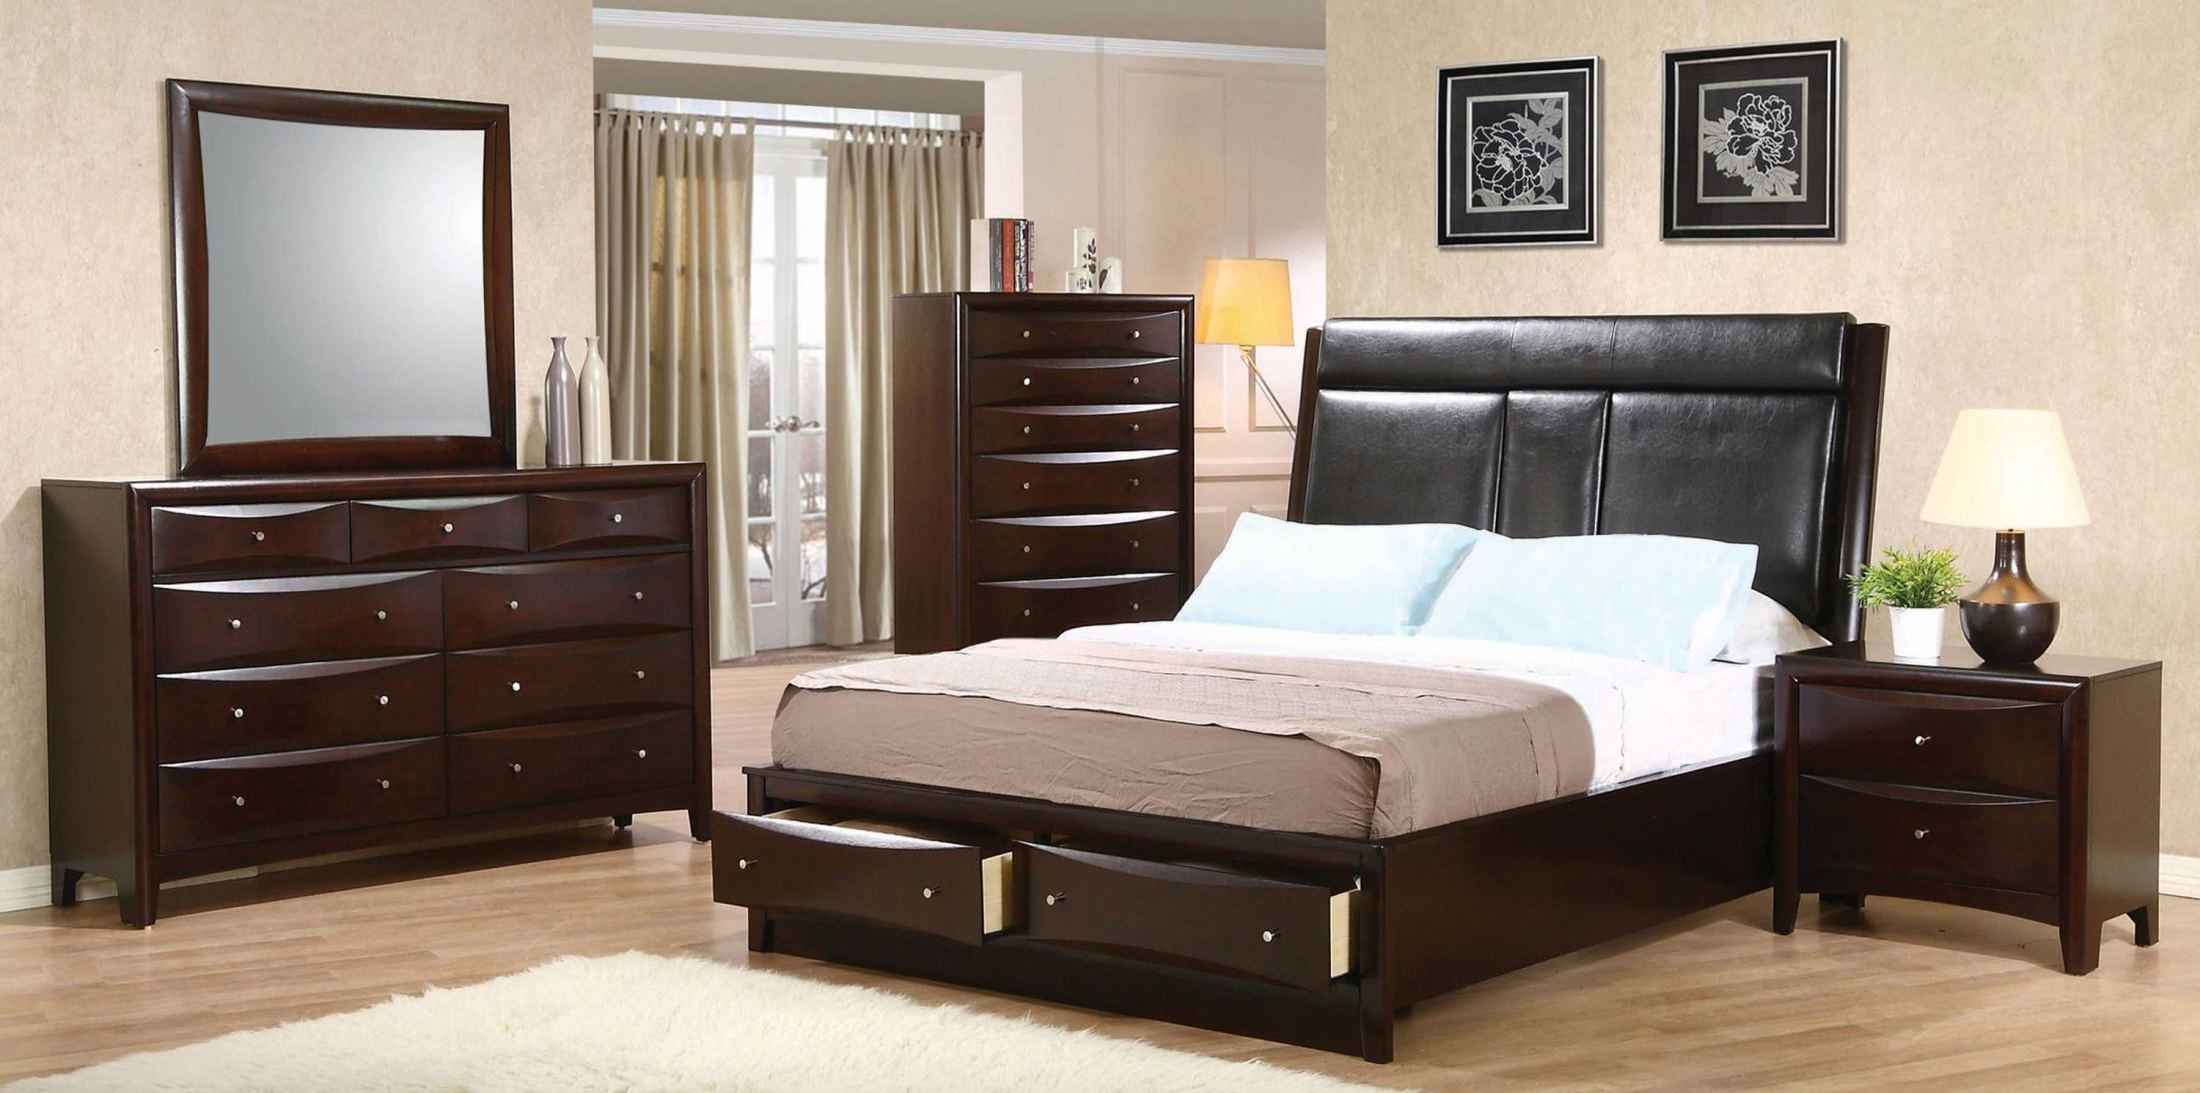 phoenix upholstered storage bedroom set from coaster 200419q